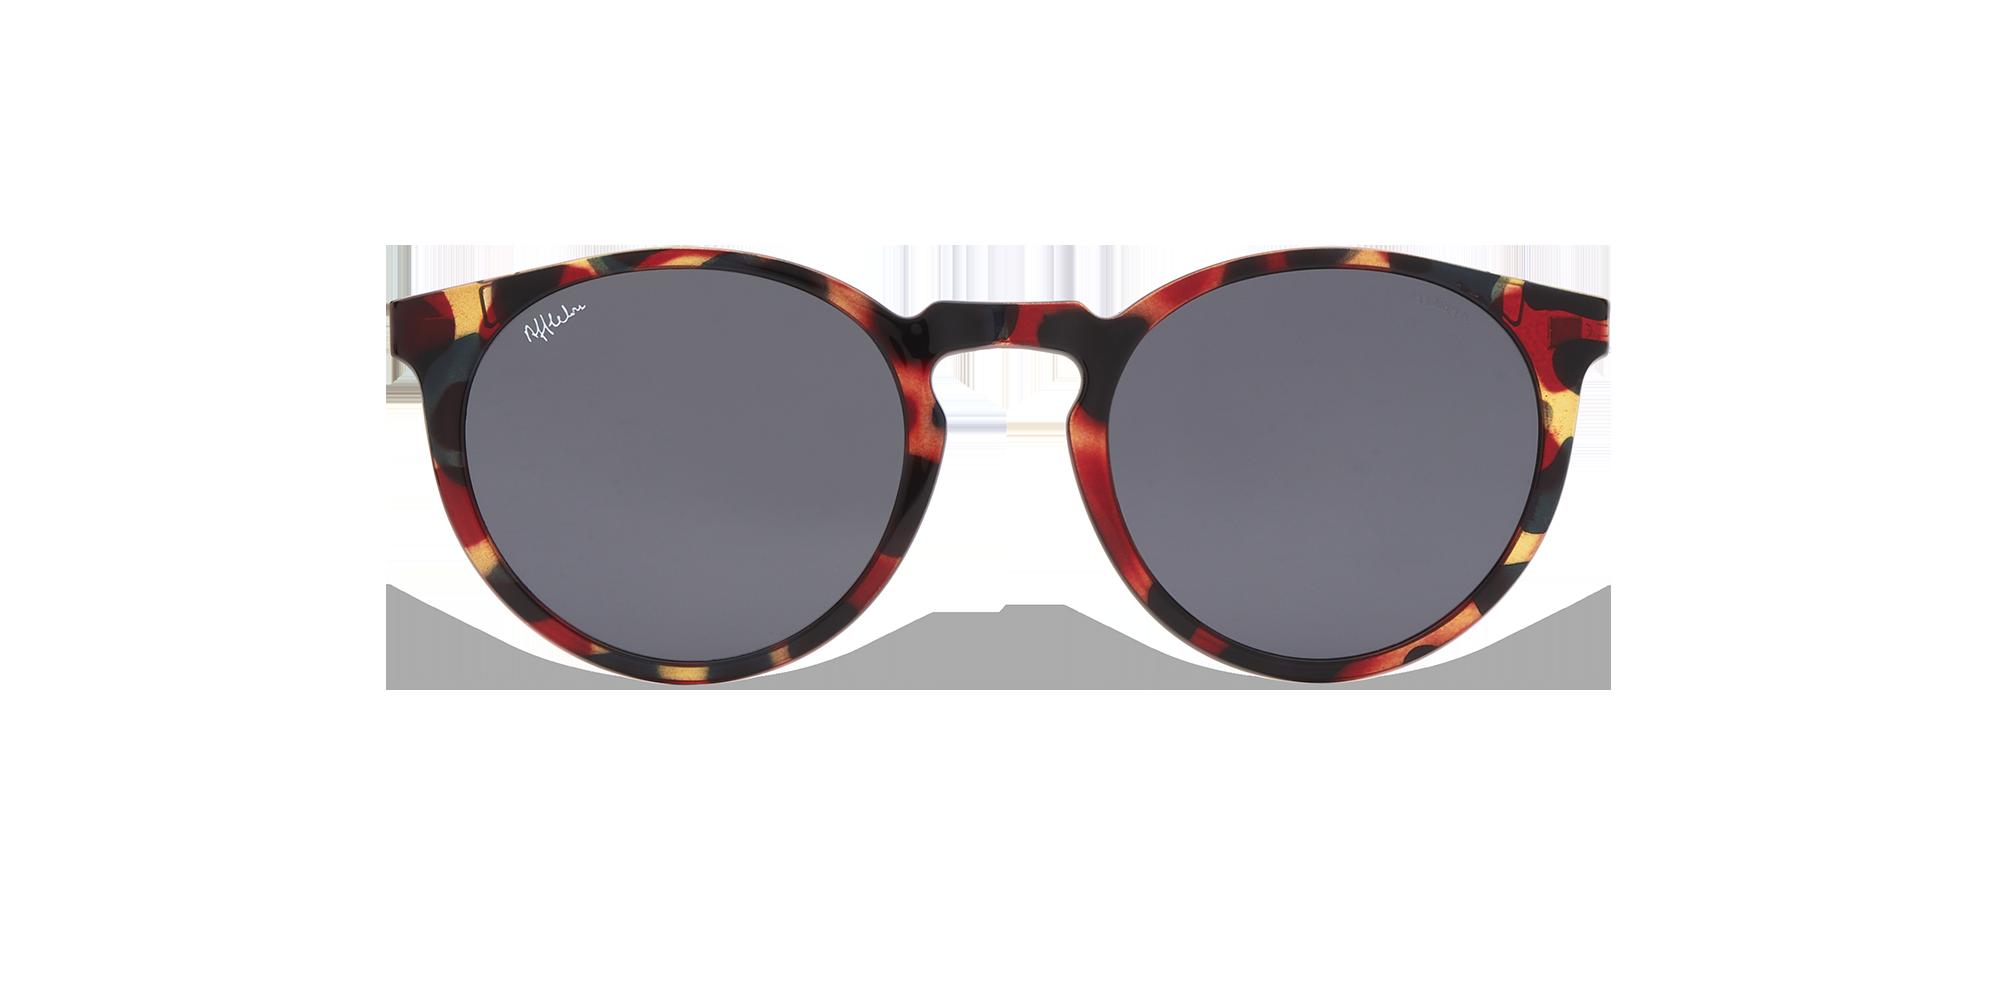 afflelou/france/products/smart_clip/clips_glasses/TMK35POTO024820.png